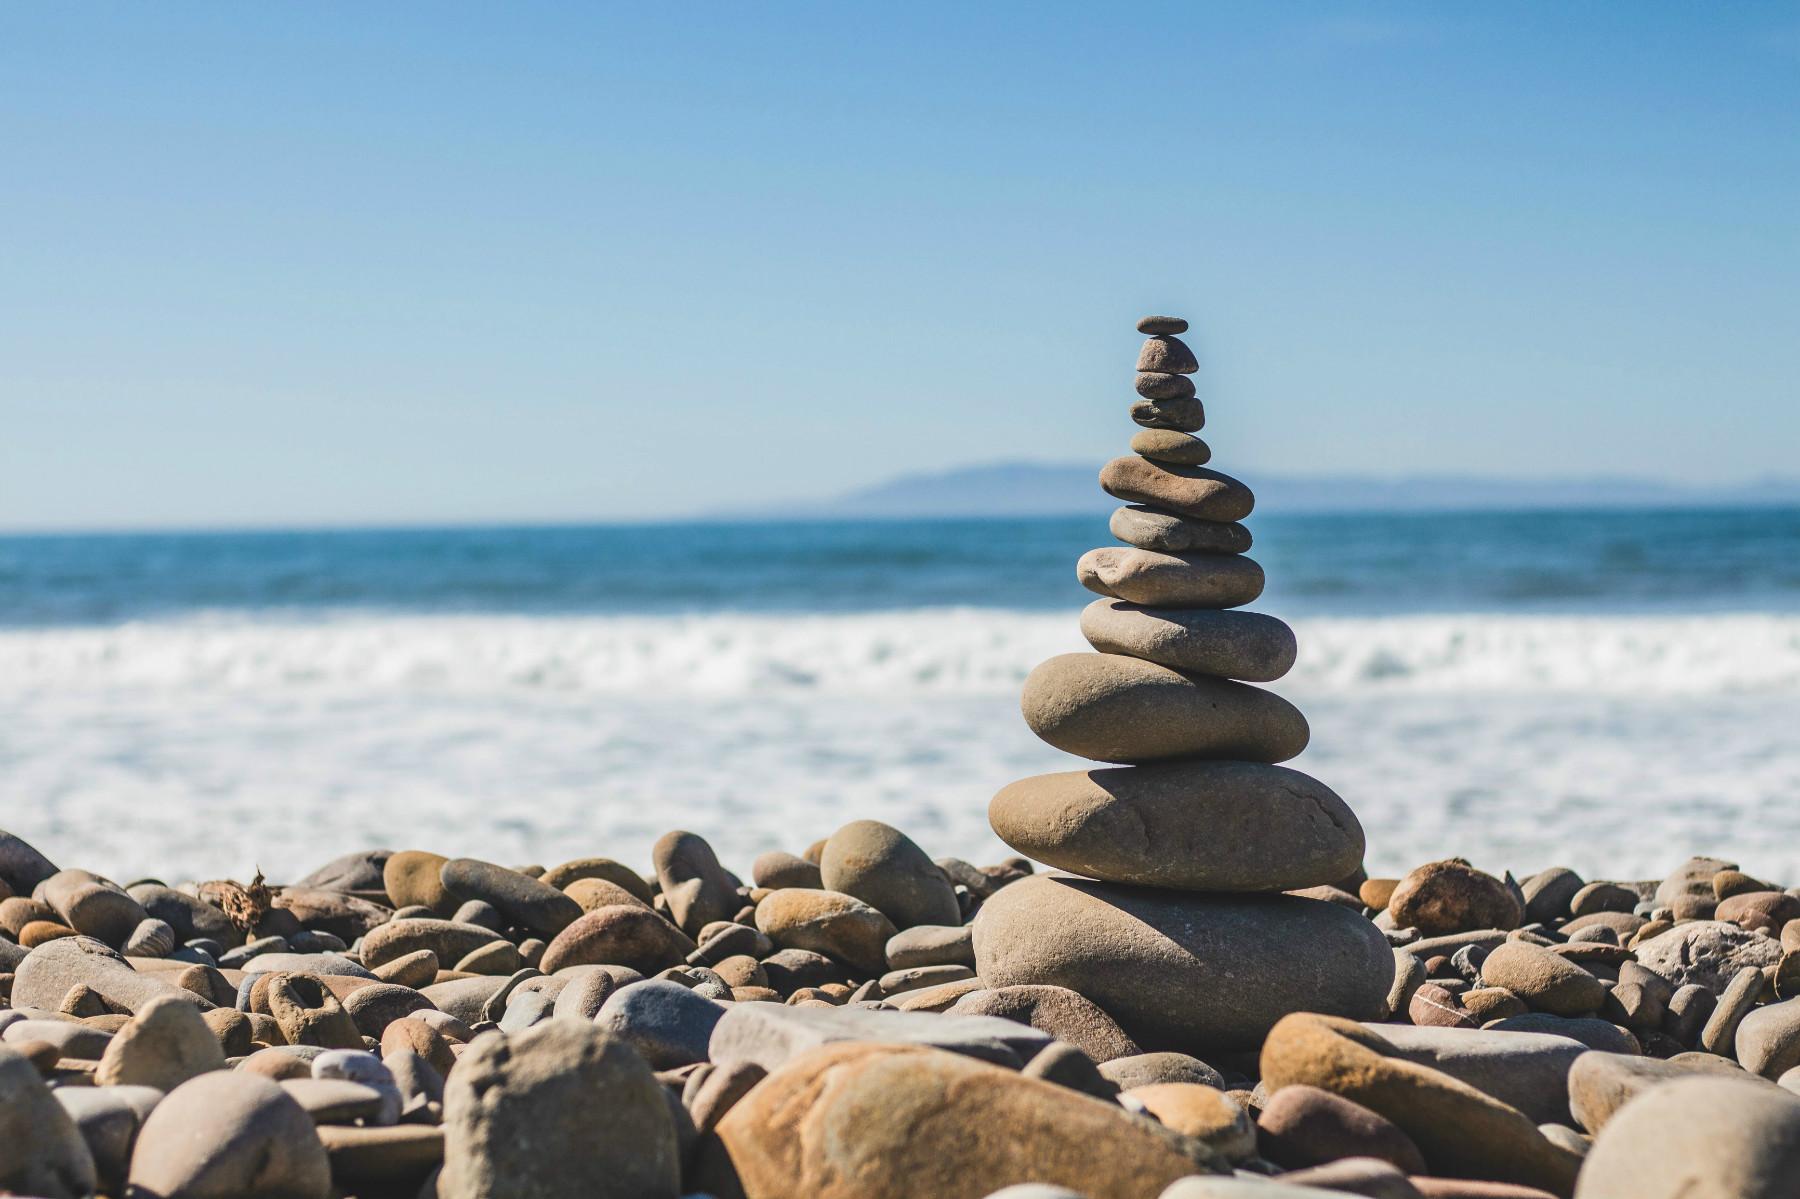 Kamnita plaža Vodice